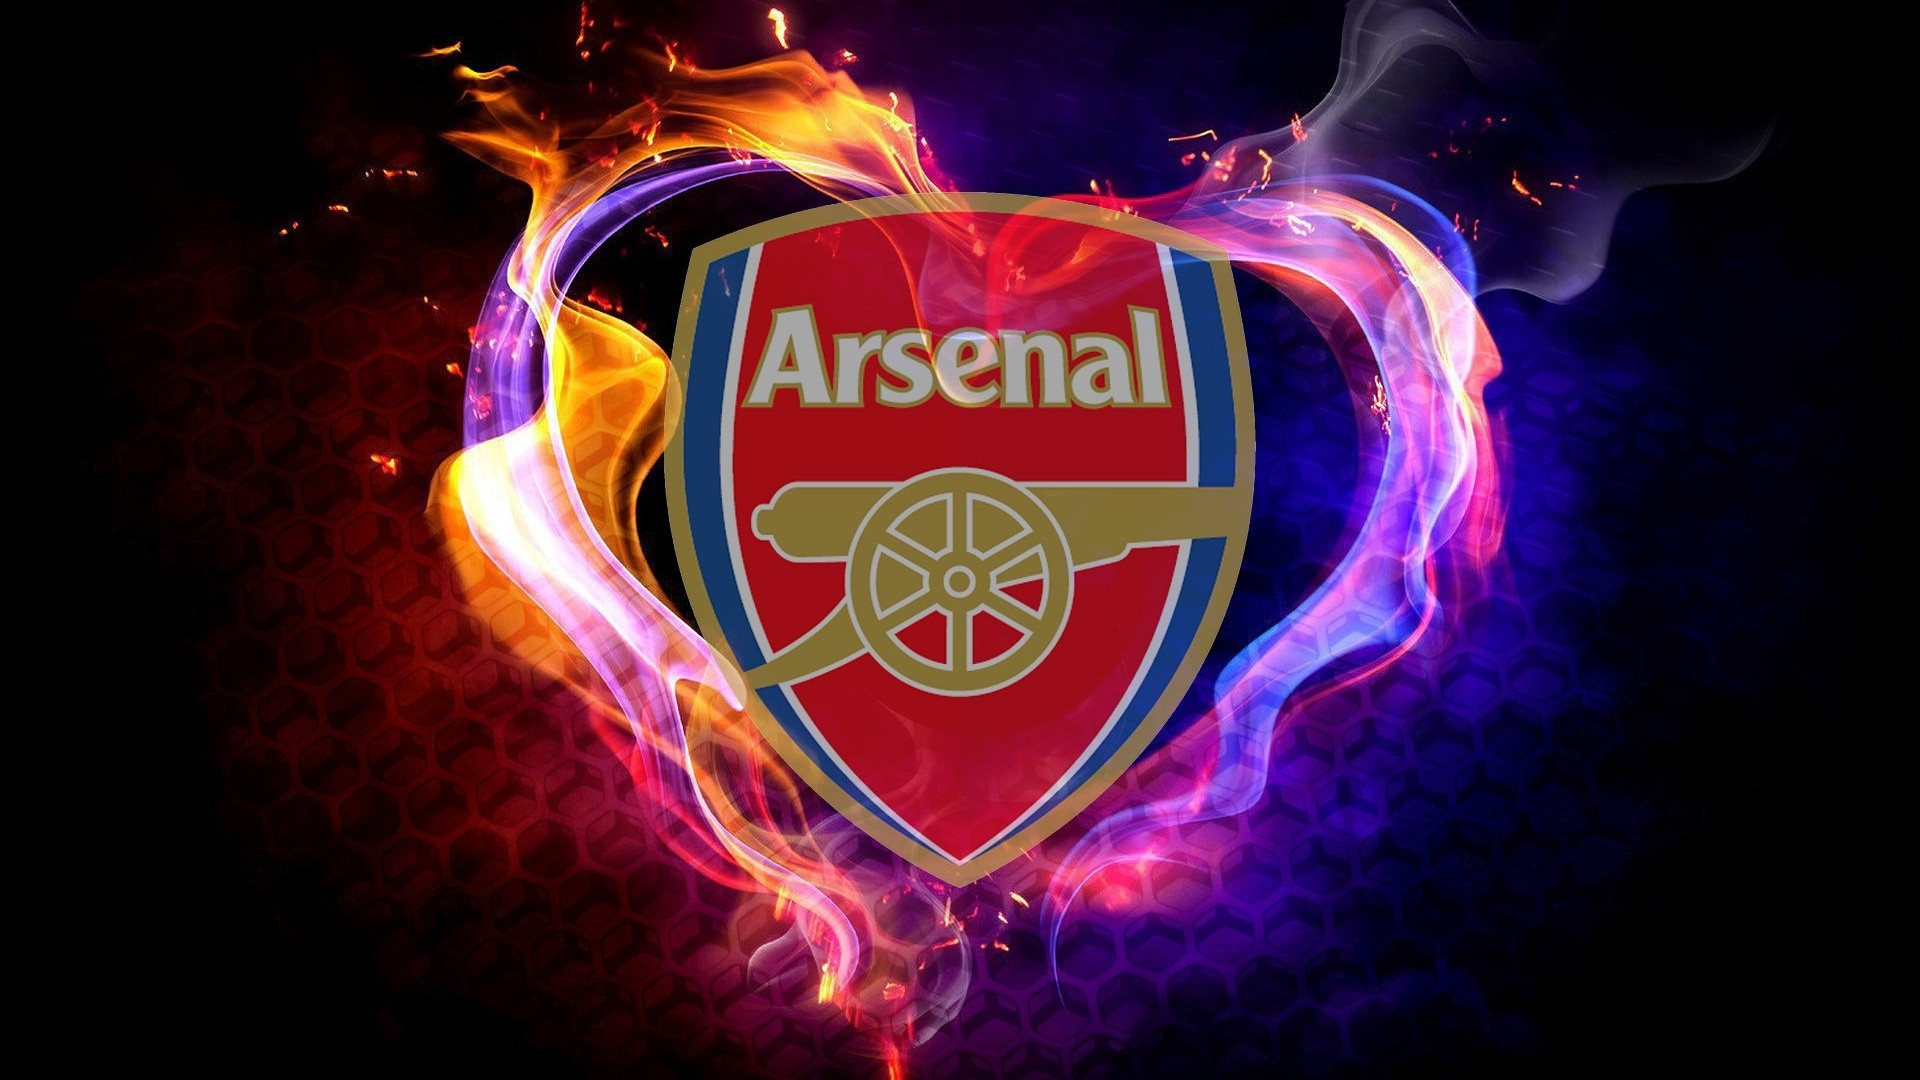 Arsenal Wallpaper Picture hd